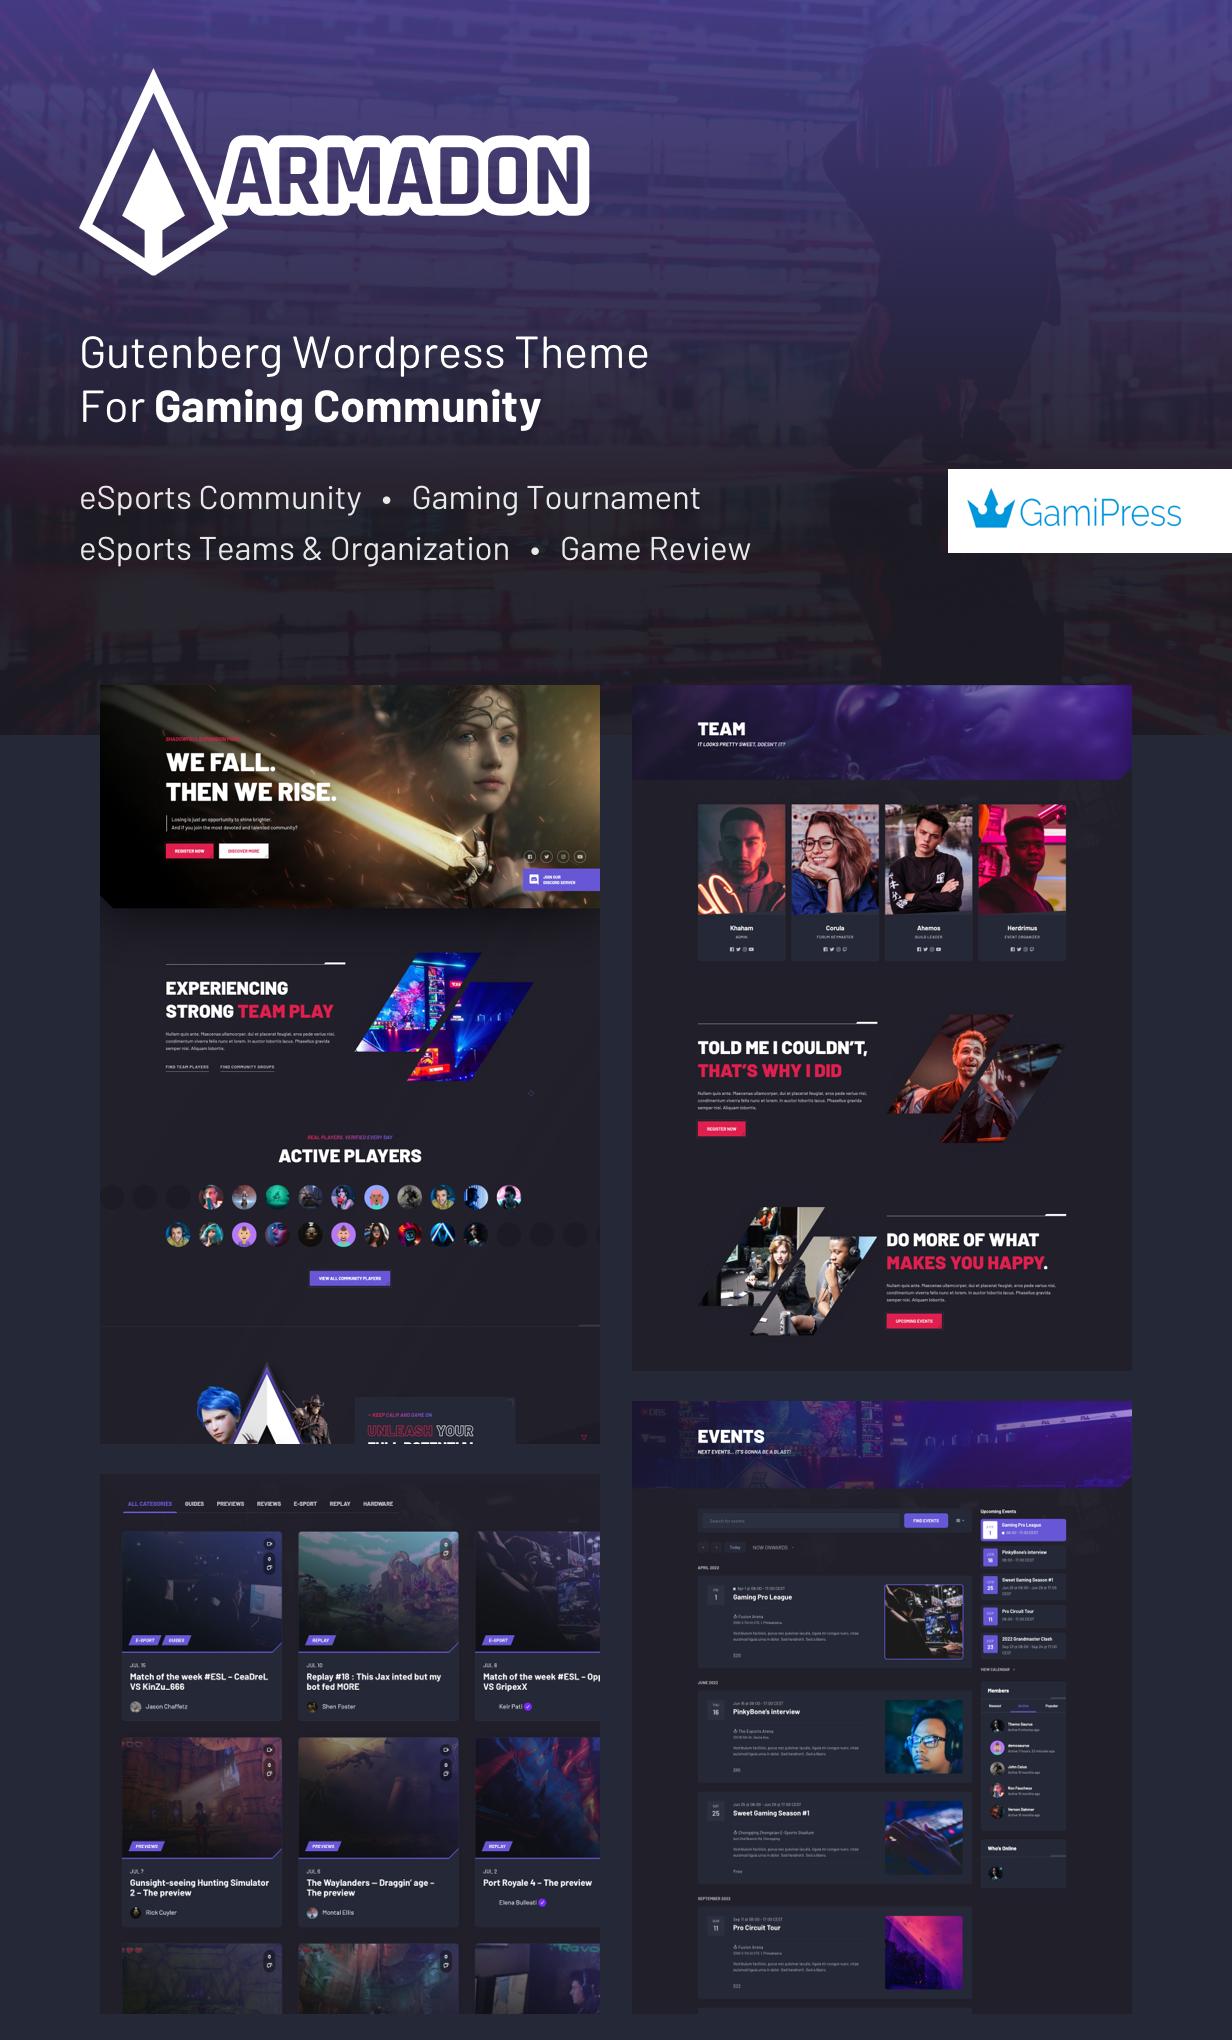 Armadon - Gutenberg WordPress Theme & For Gaming Community - 1